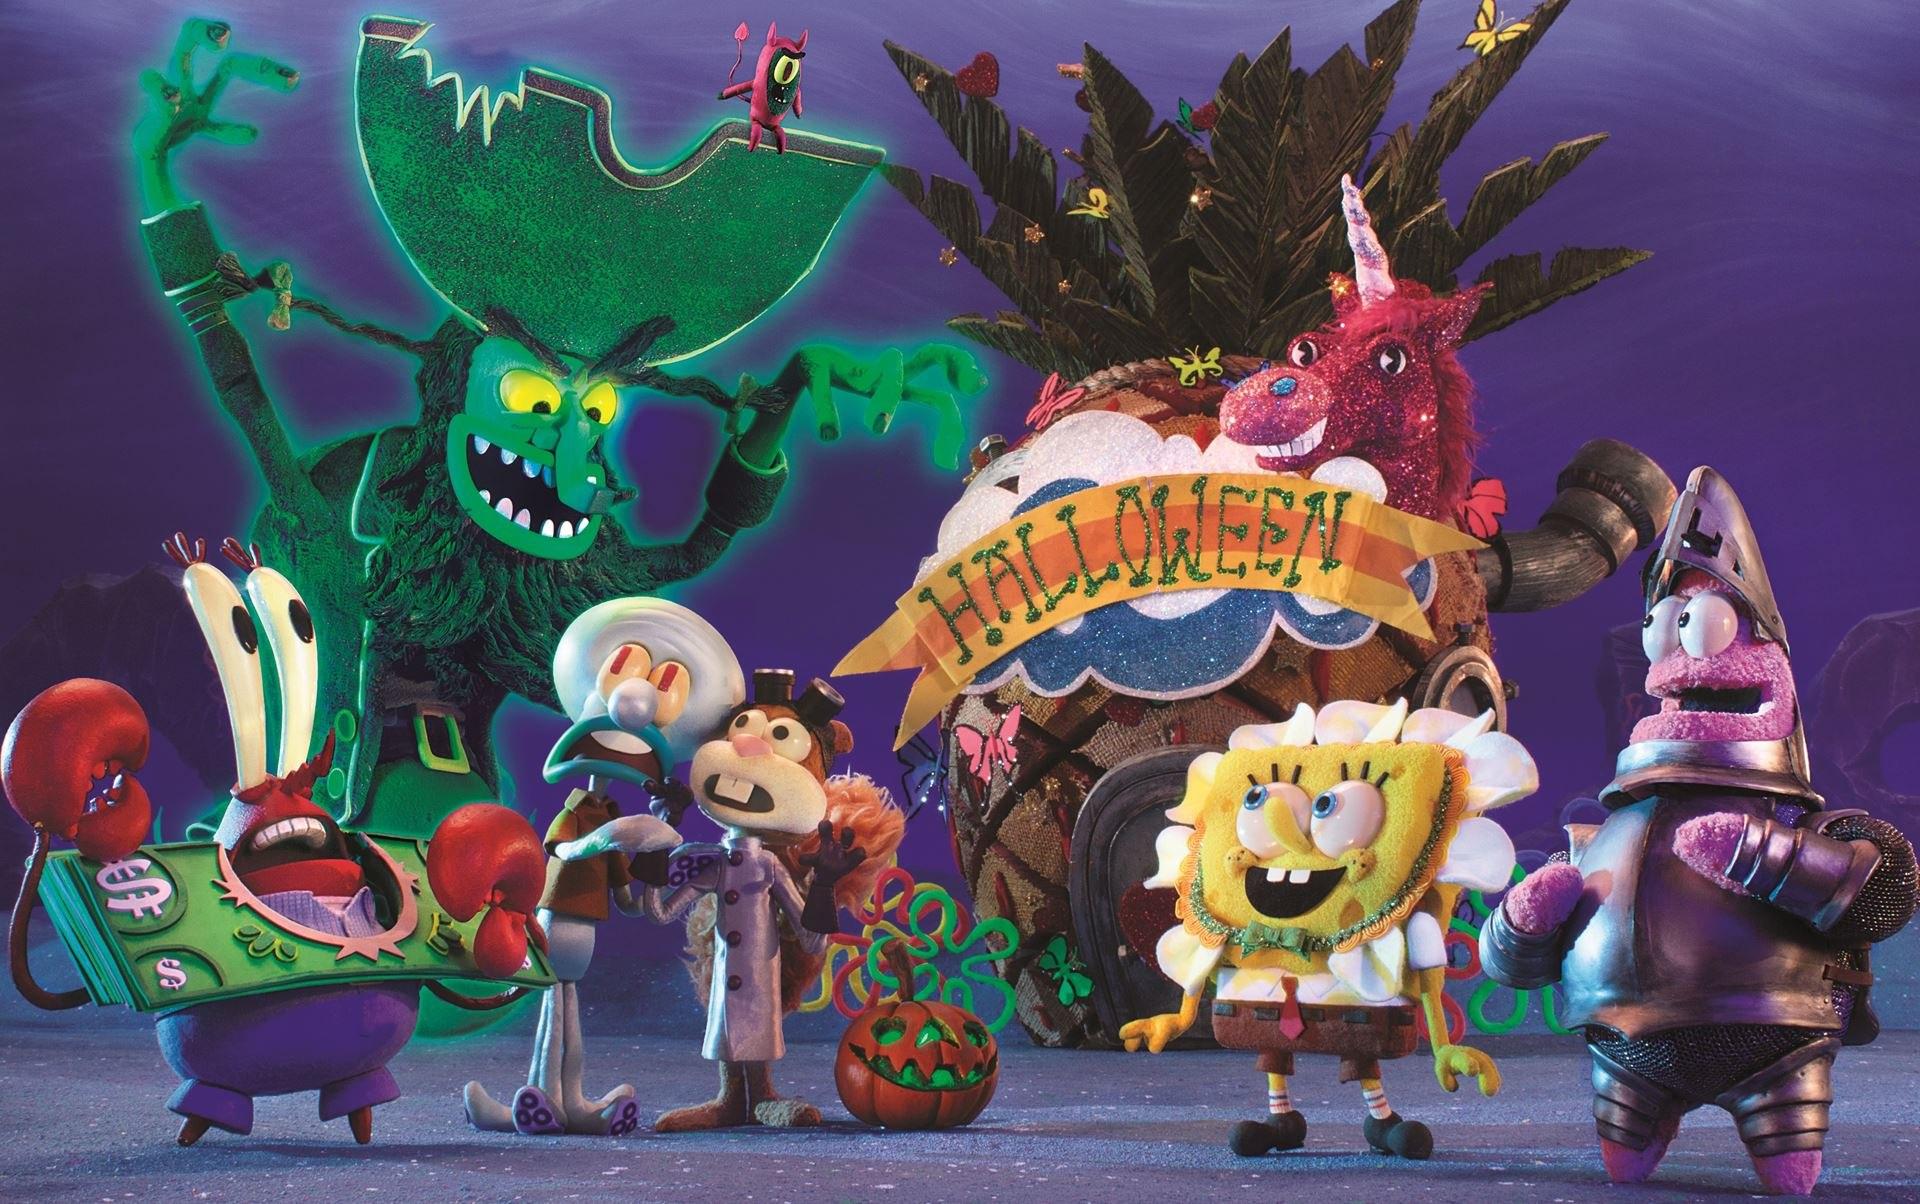 SpongeBob-SquarePants-Legend-of-Bookini-Bottom